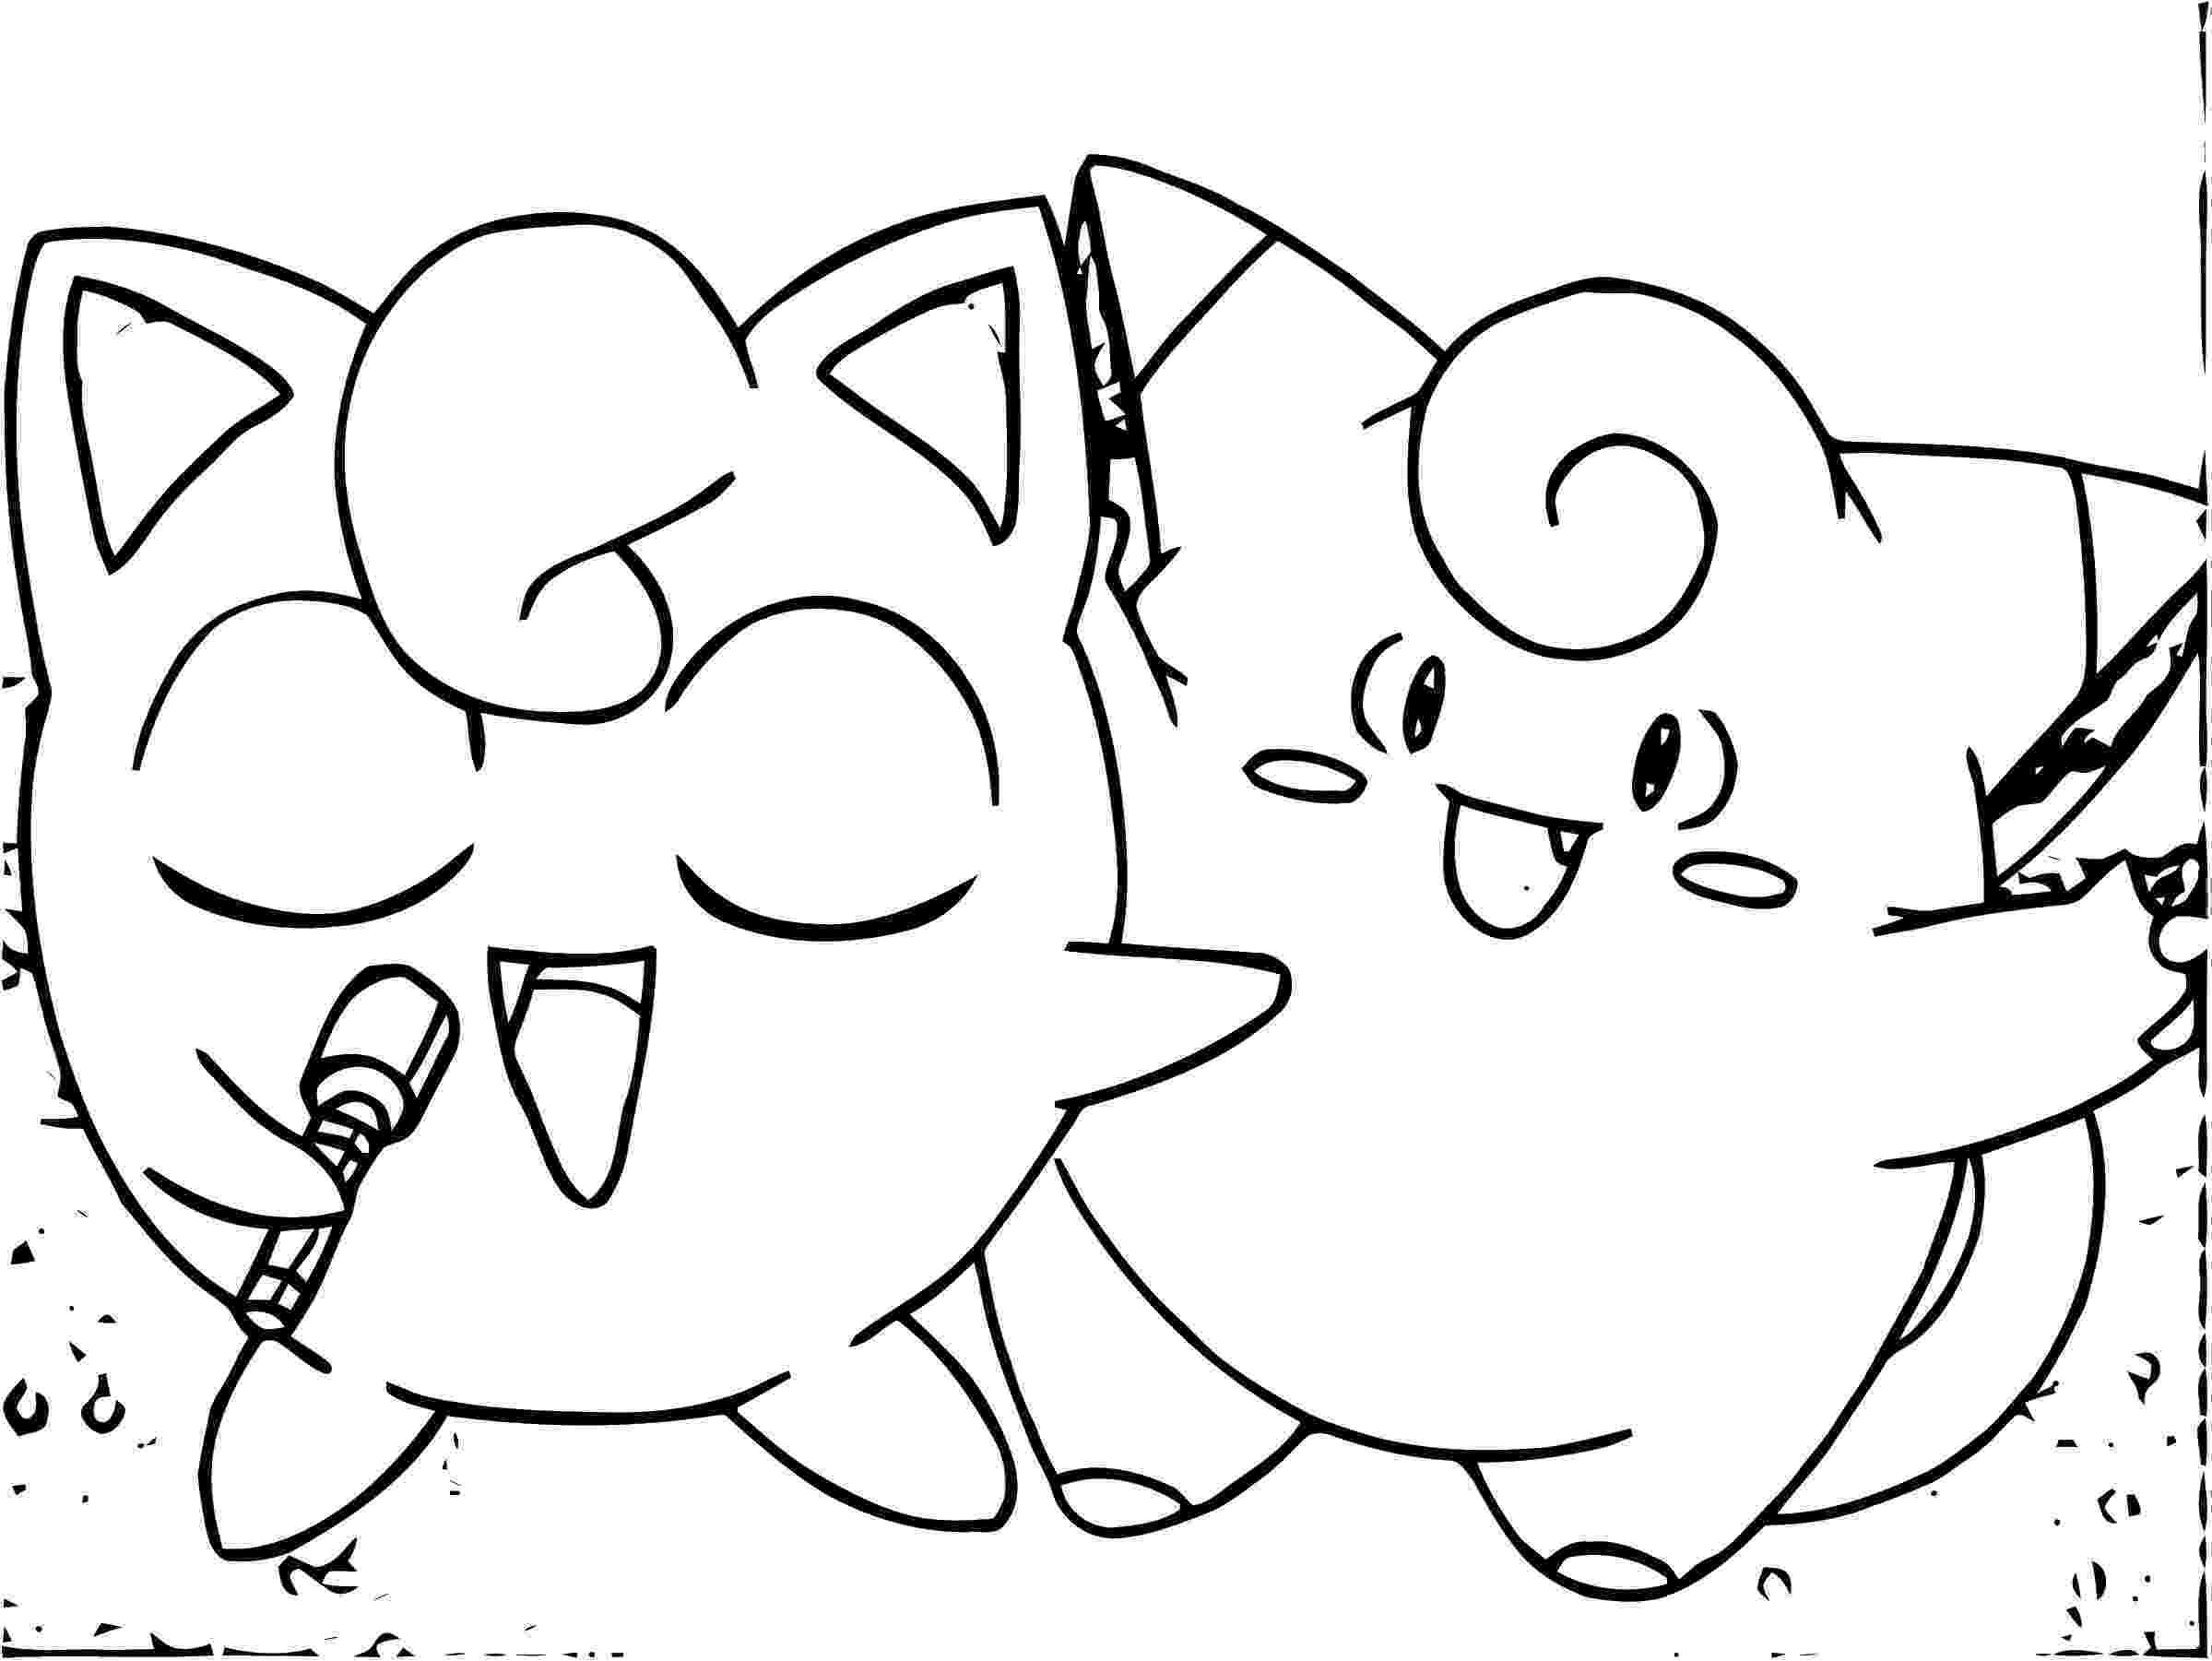 jigglypuff coloring pages jigglypuff coloring pages jigglypuff coloring pages jigglypuff pages coloring